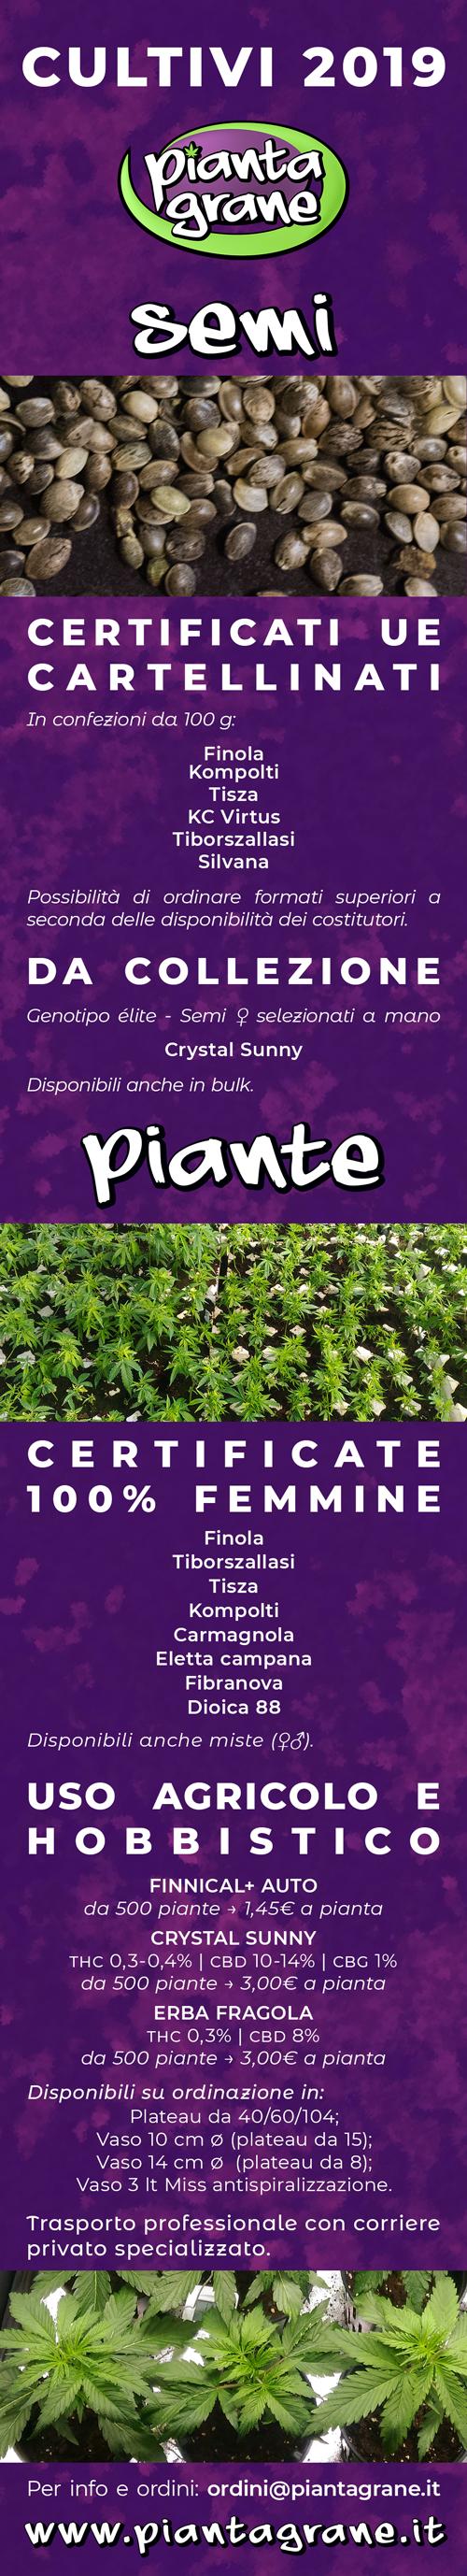 seed & plants | Piantagrane | Seed Grow Hemp CBD Shop